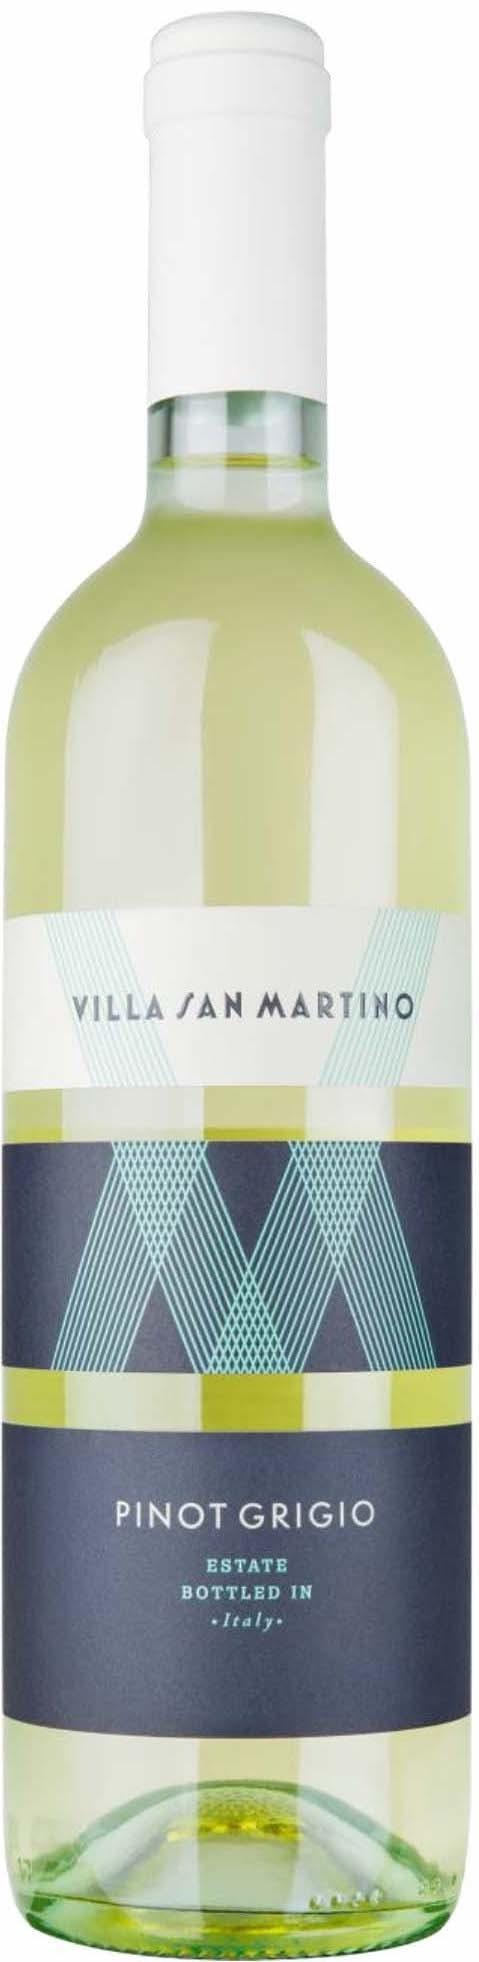 Villa San Martino Pinot Grigio 2018 1 5l Spirited Wines